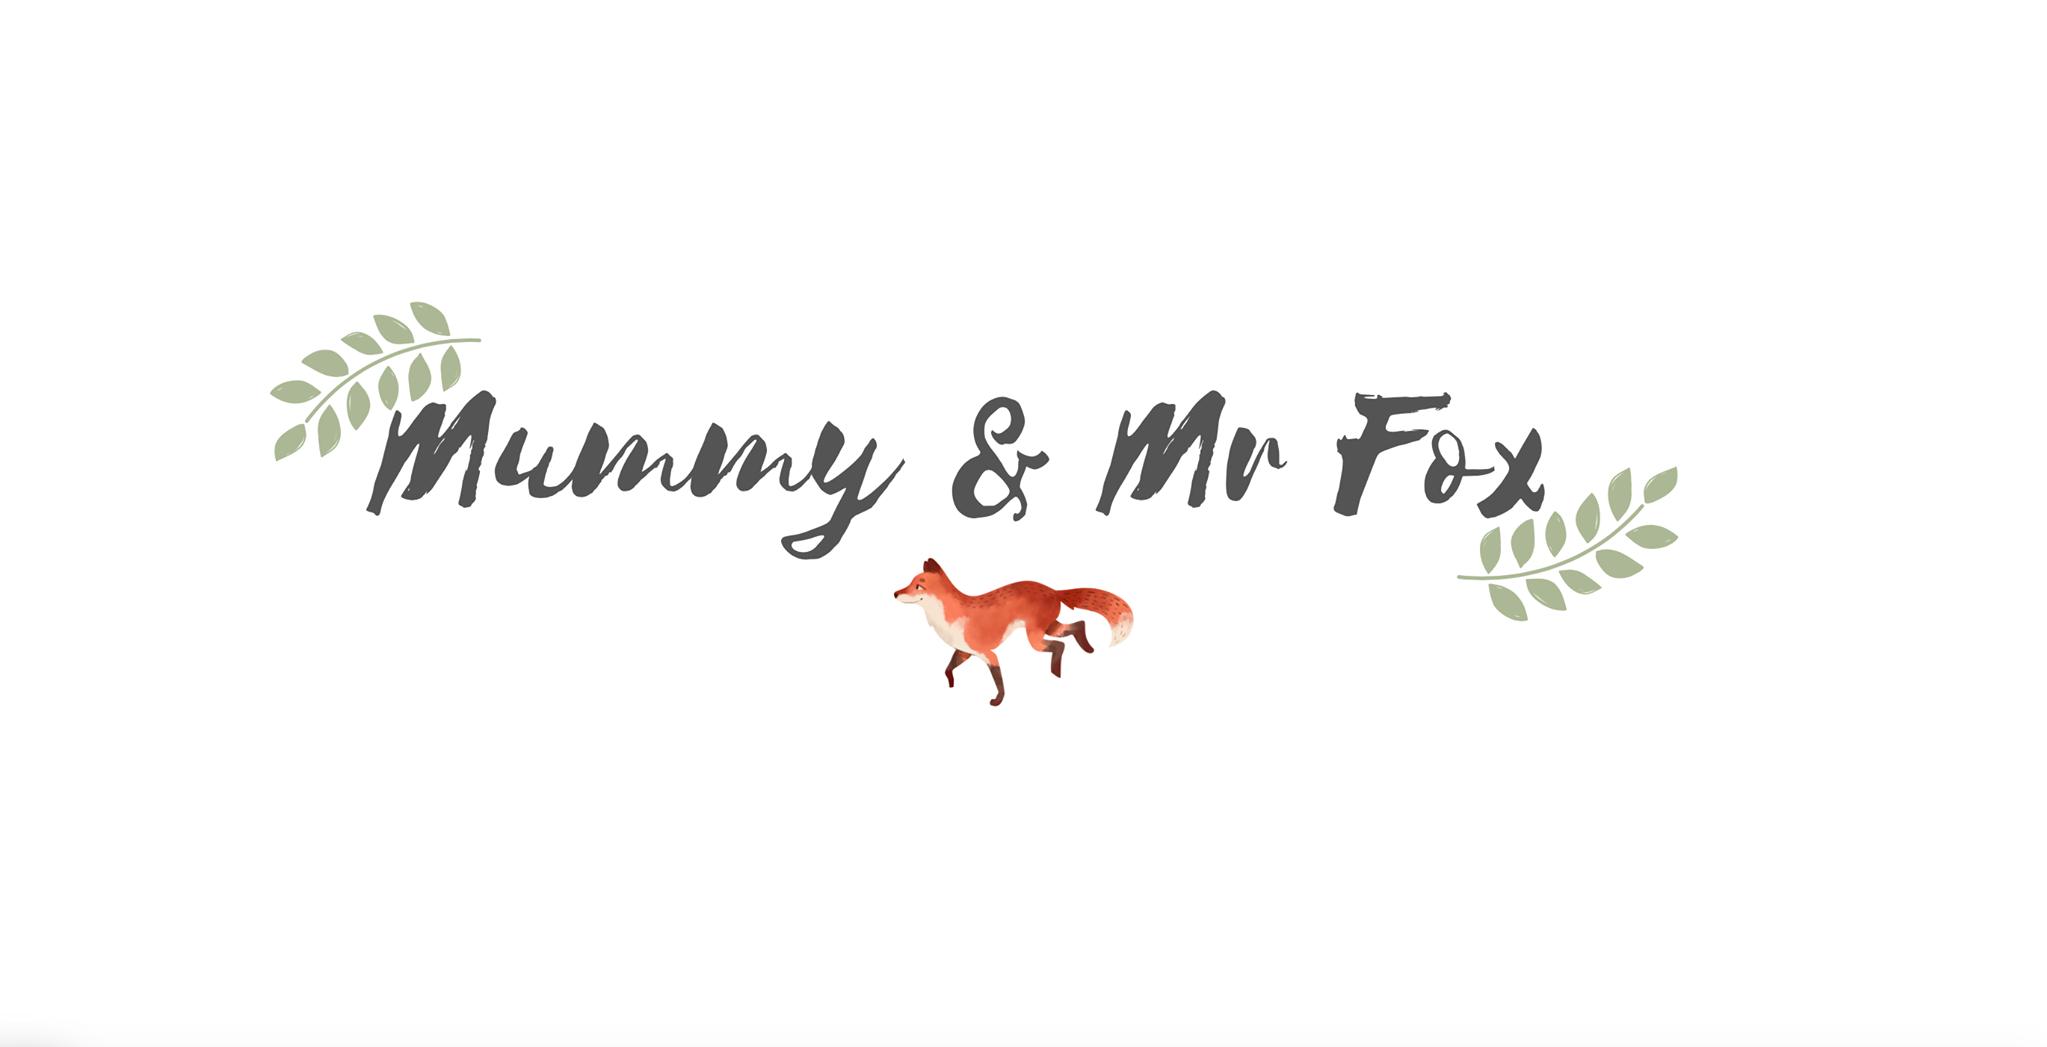 Mummy and Mr Fox